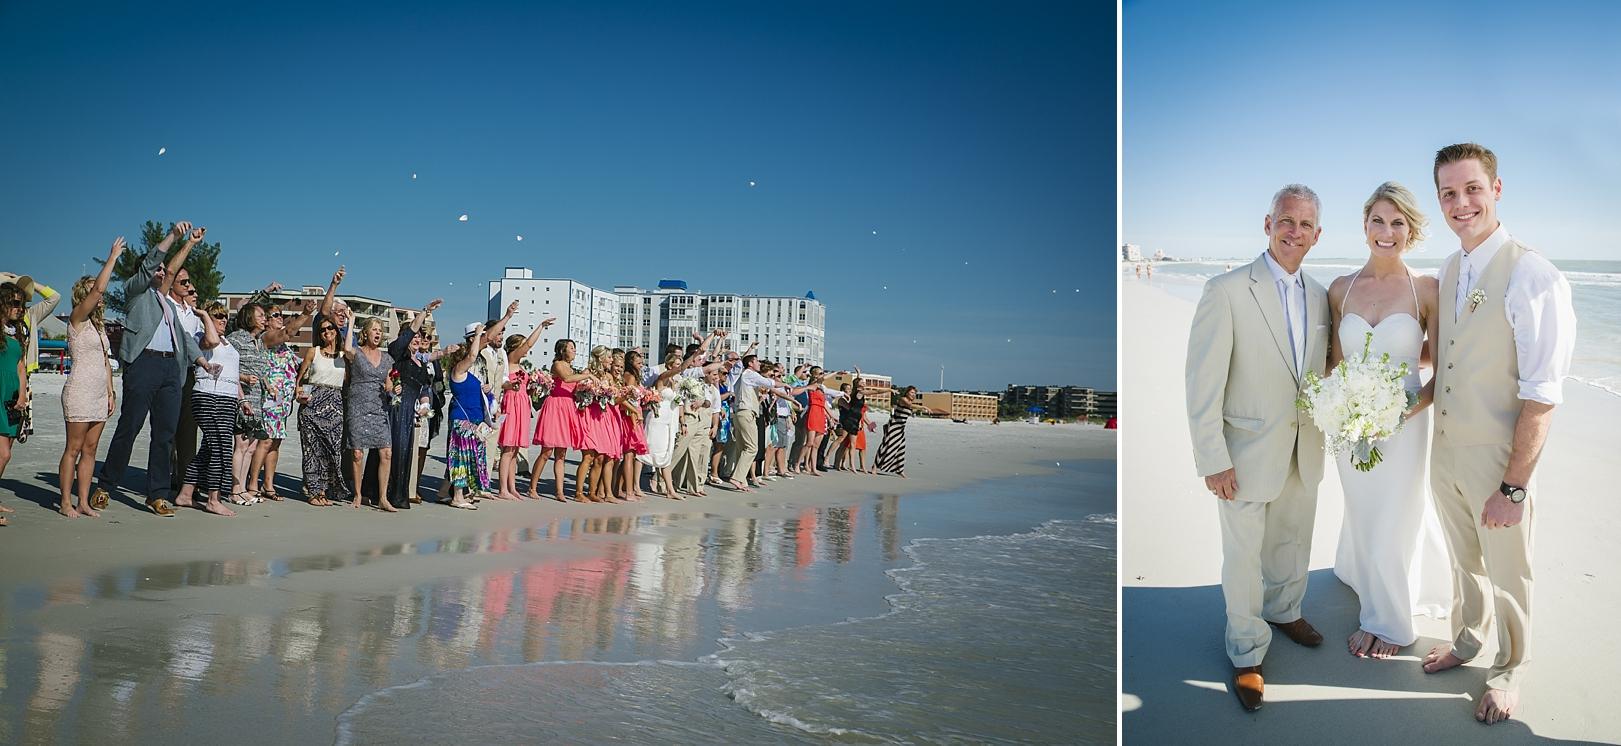 sirata beach wedding photos reverend rick st pete beach